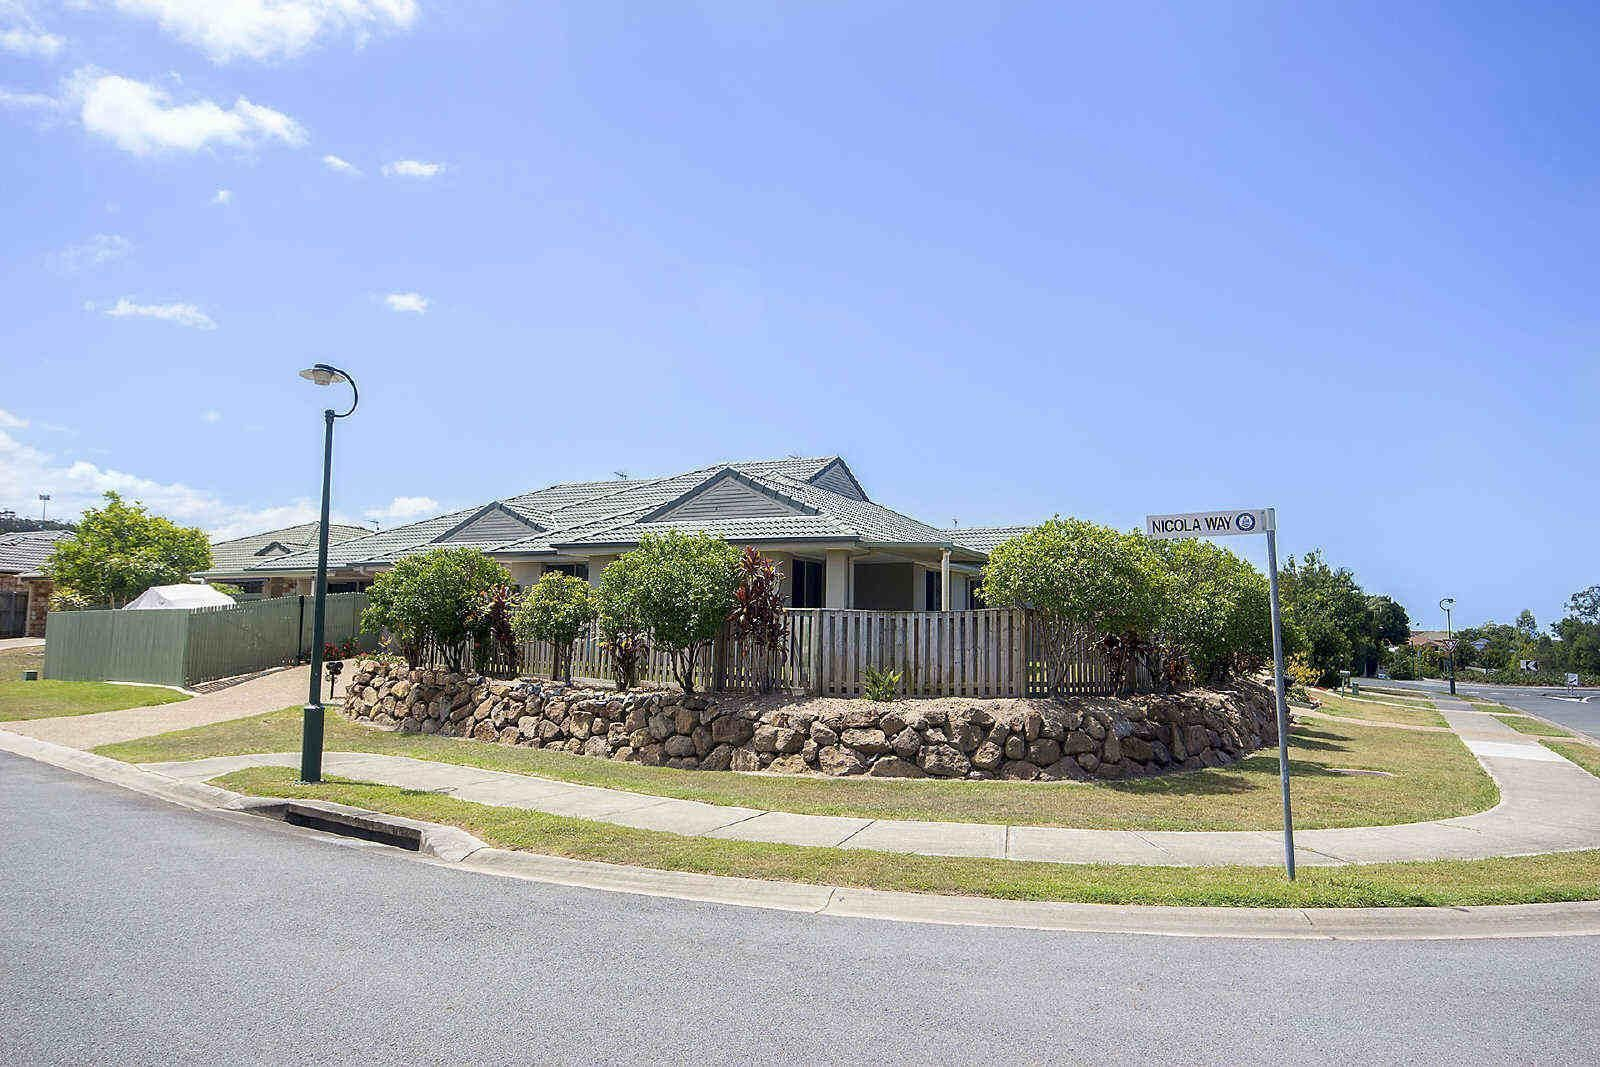 2/5 Schmarr Avenue, Upper Coomera QLD 4209, Image 0